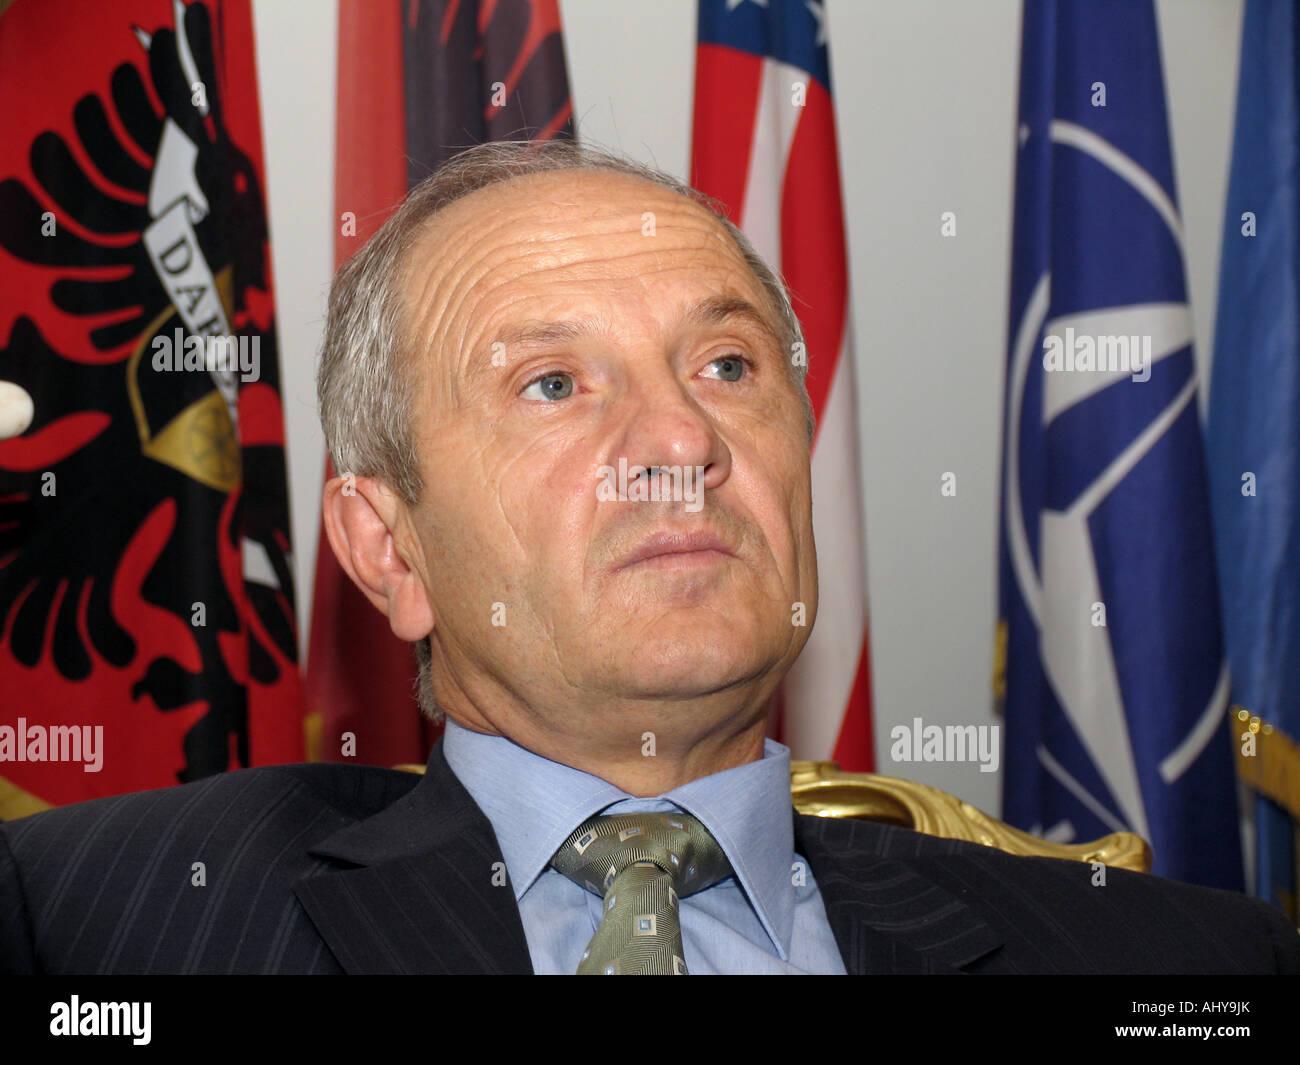 Fatmir Sejdiu - President of Kosovo, a Serbian province under UN administration since the 1999 Kosovo War Stock Photo